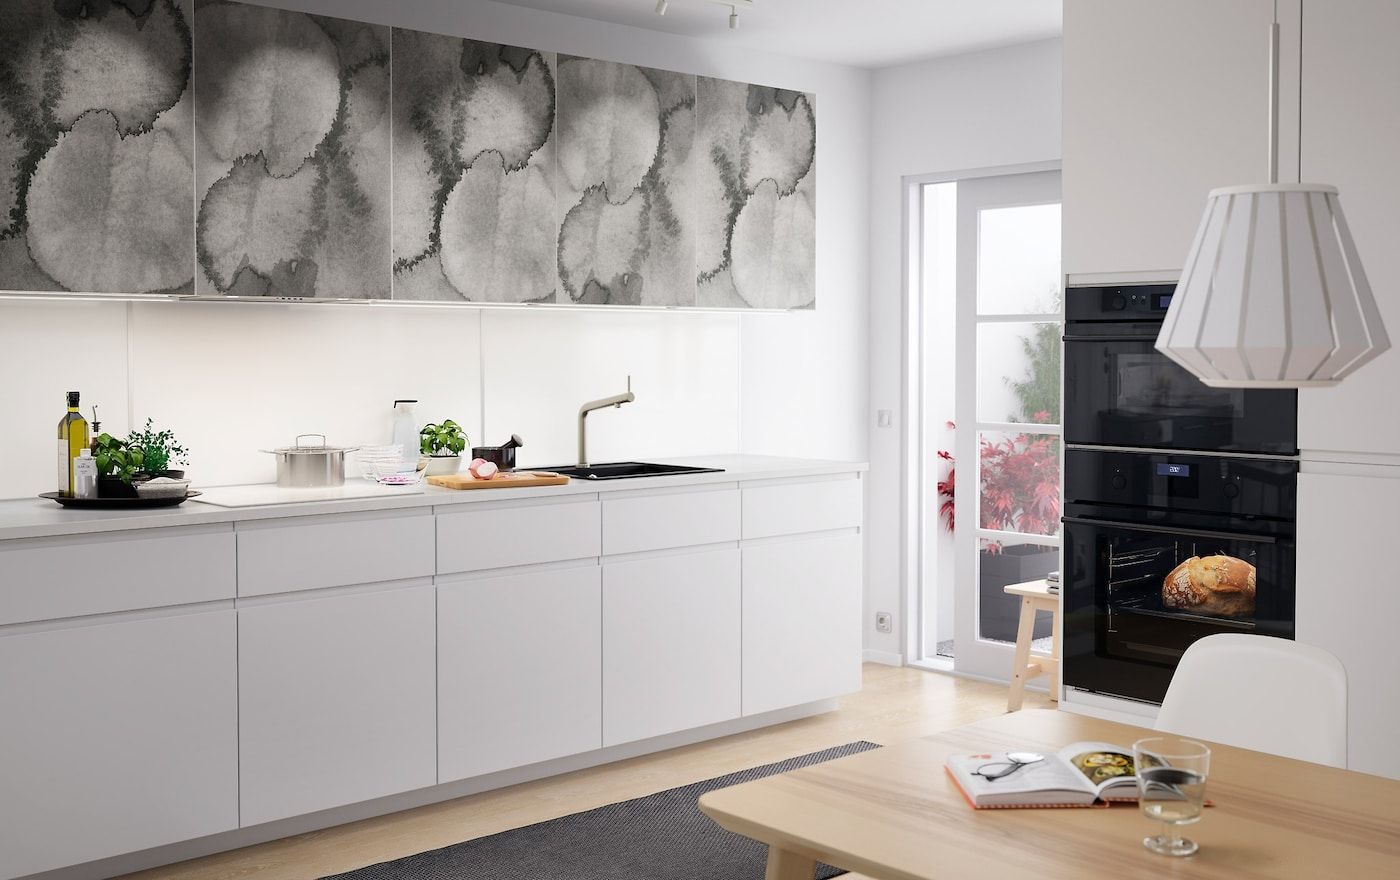 Mobel Einrichtungsideen Fur Dein Zuhause Cuisine Moderne Blanche Cuisine Blanche Ikea Meuble De Cuisine Ikea